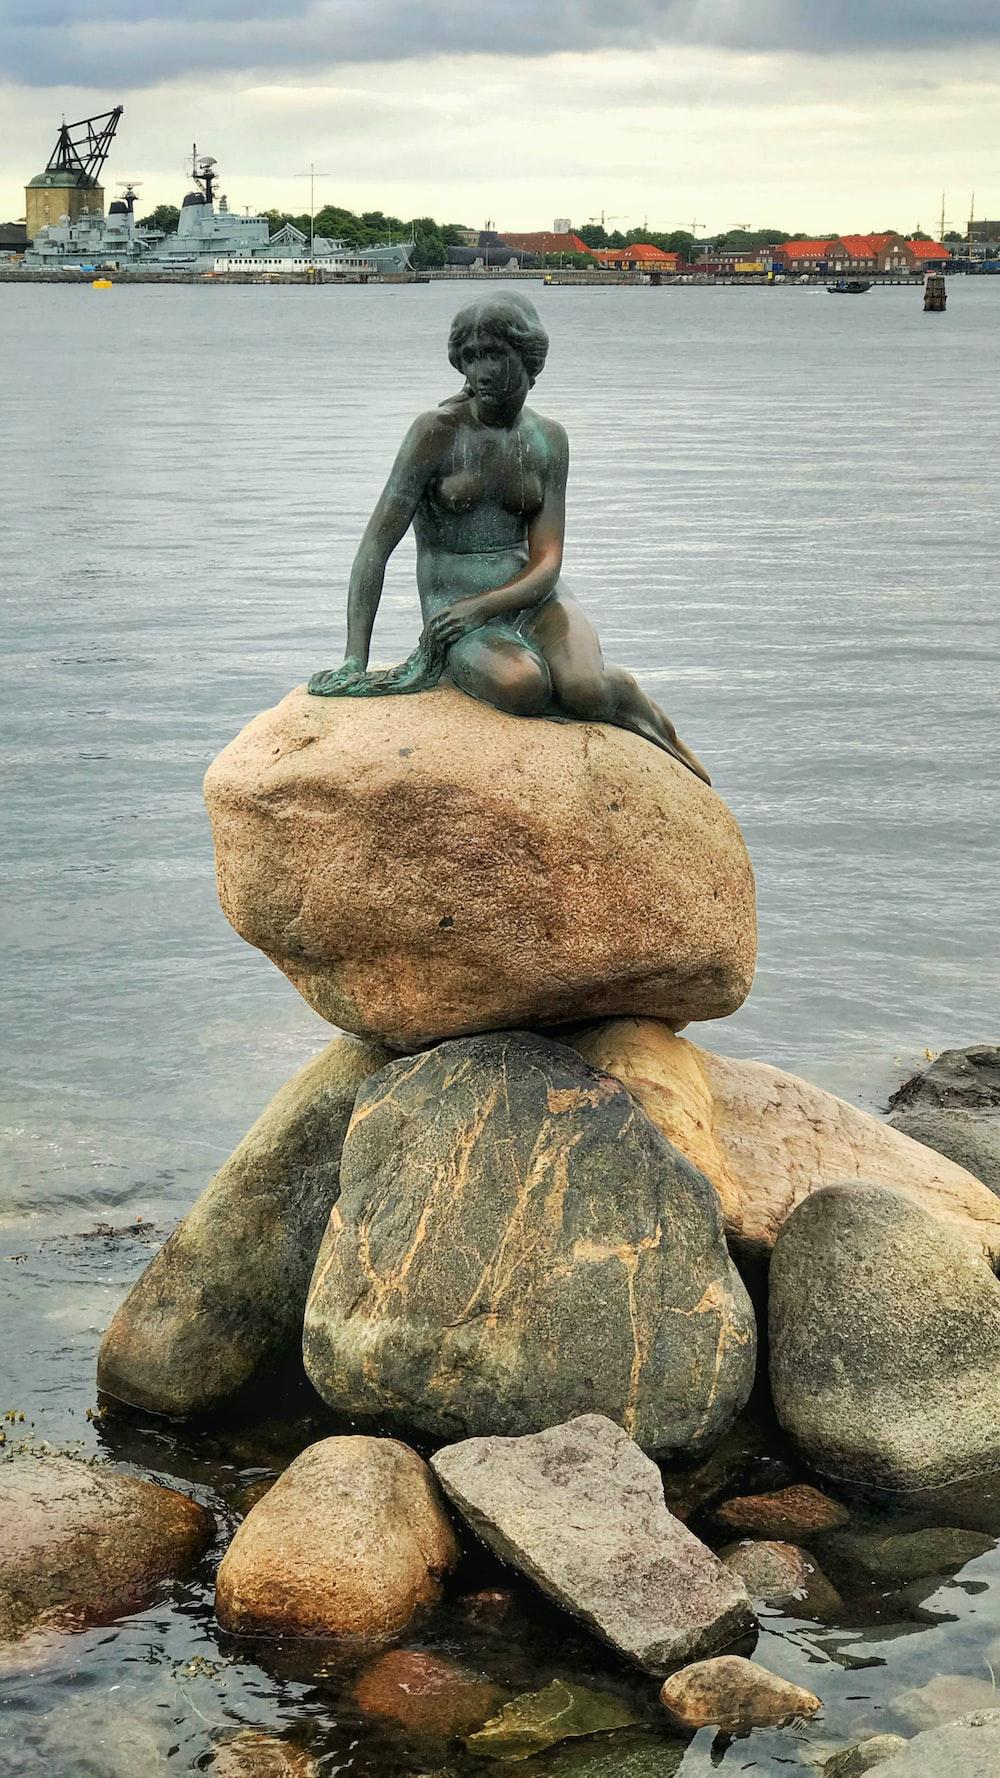 The Little Mermaid statue